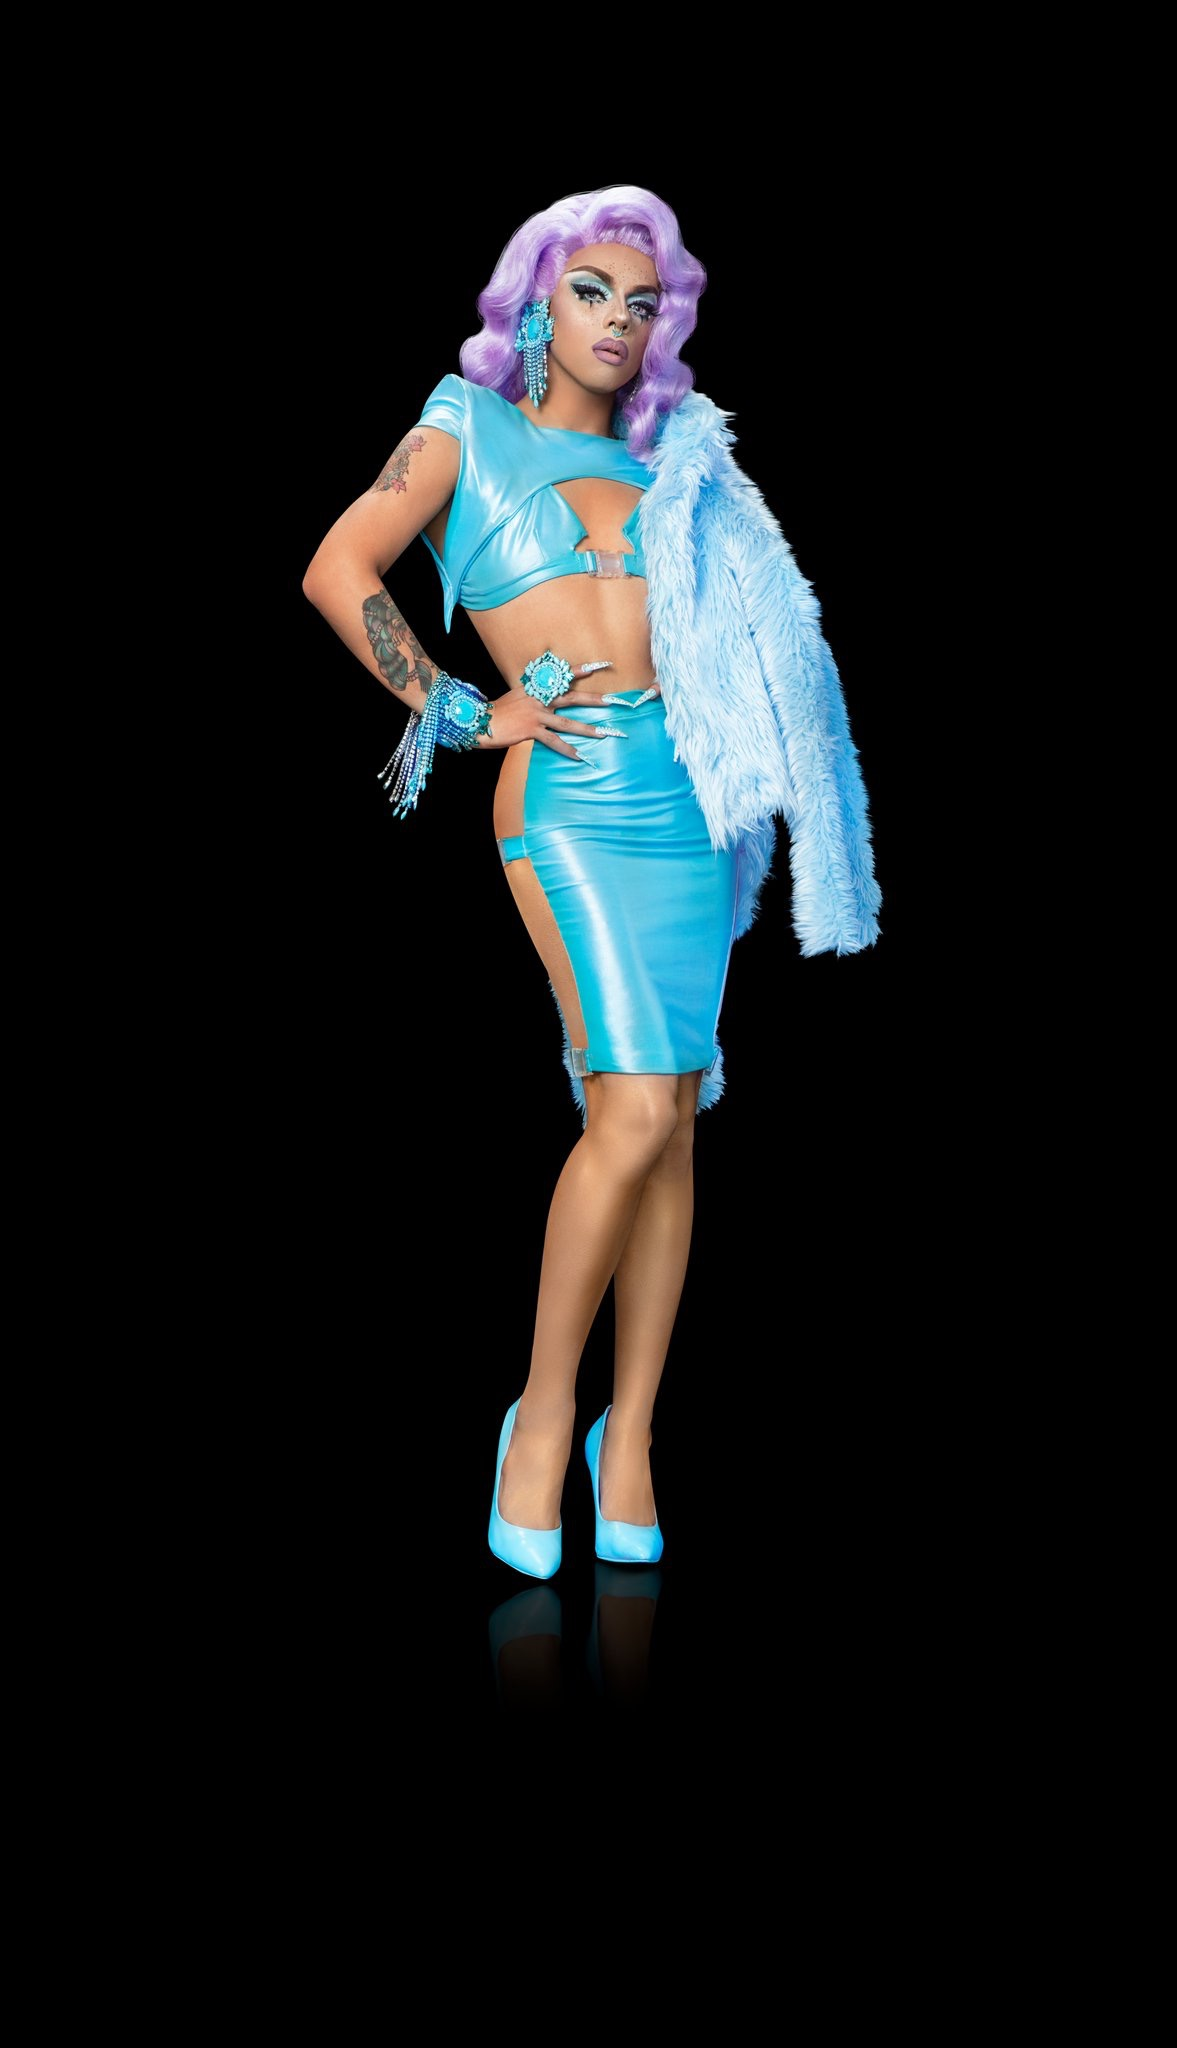 Rupaul's Drag Race Hd Pics - Aja Rupaul's Drag Race , HD Wallpaper & Backgrounds